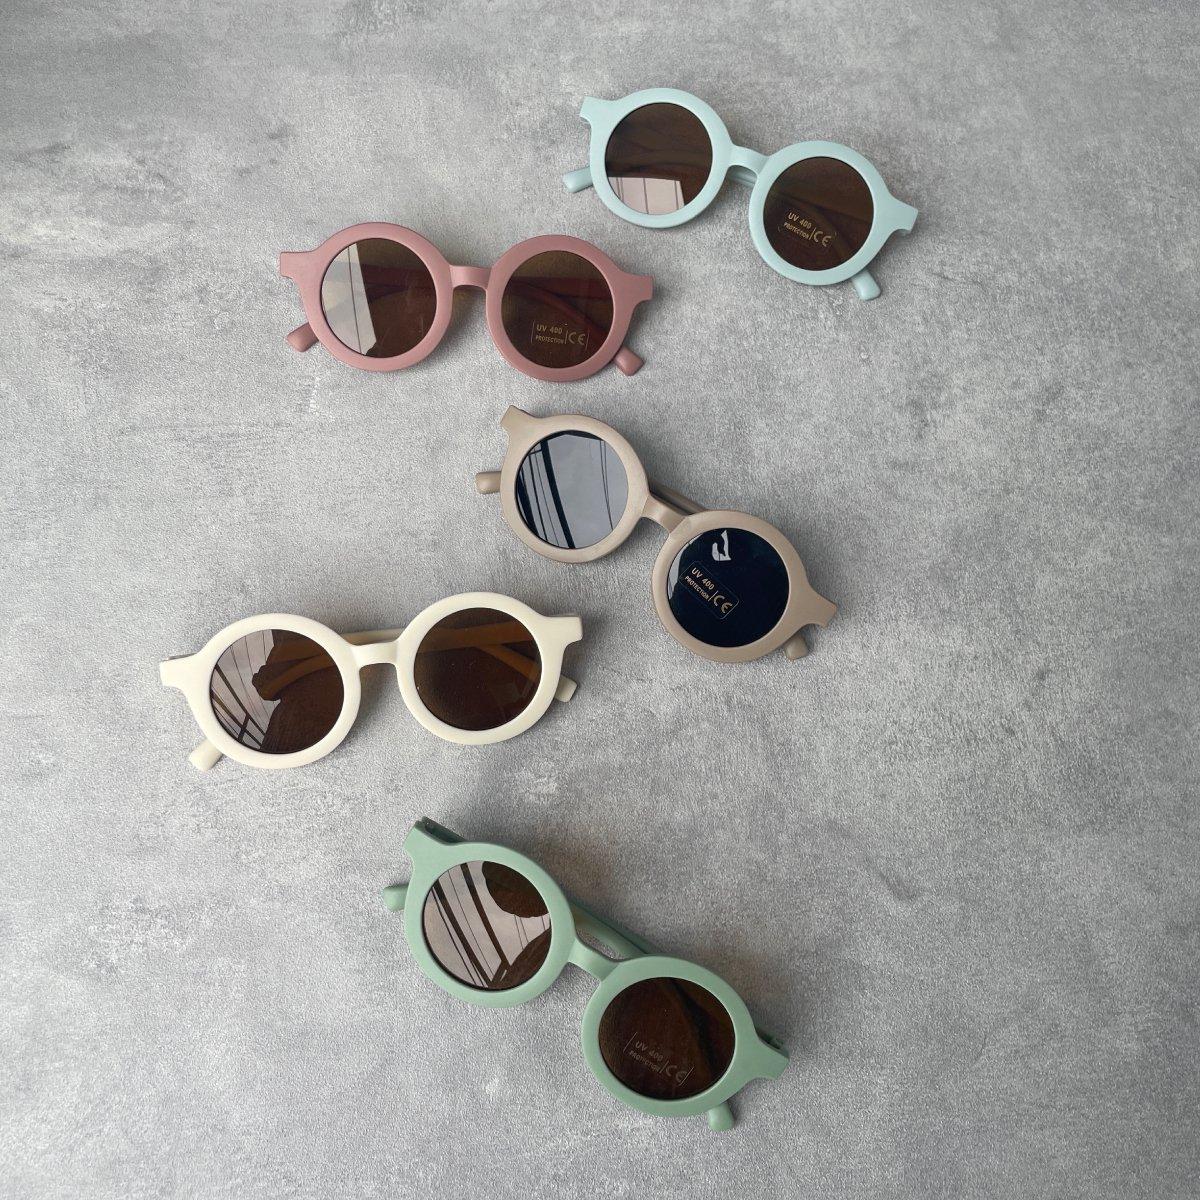 【KIDS】Kids Colorful Sunglasses 詳細画像6